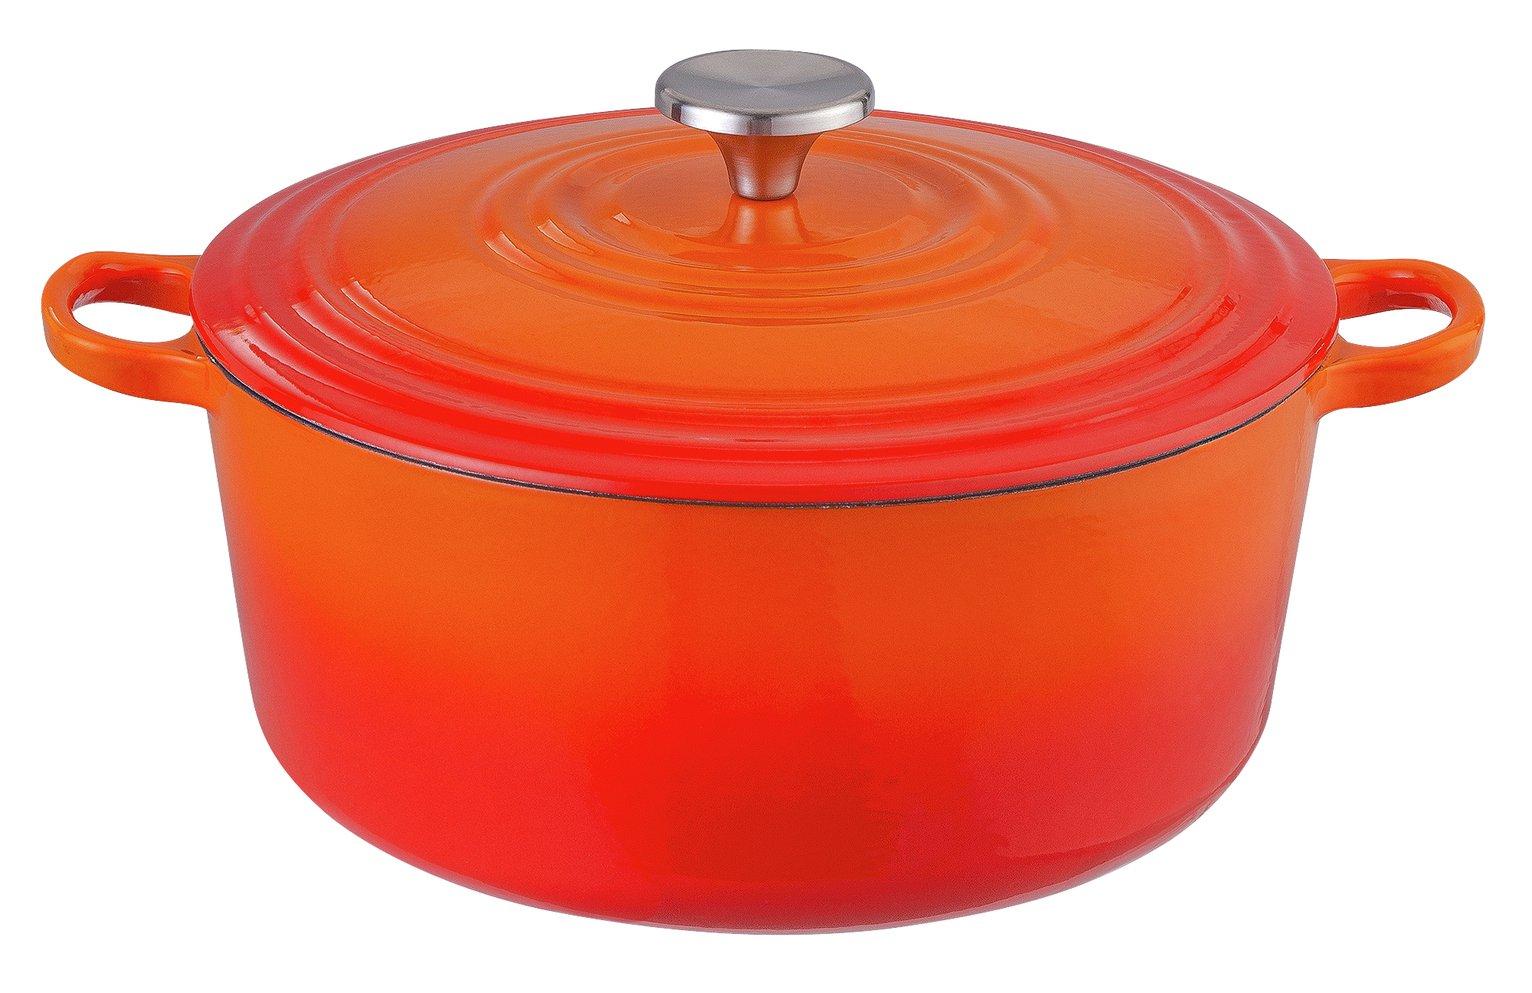 Argos Home 5.3 Litre Cast Iron Casserole Dish - Orange - £29.99 + Free Click and Collect @ Argos